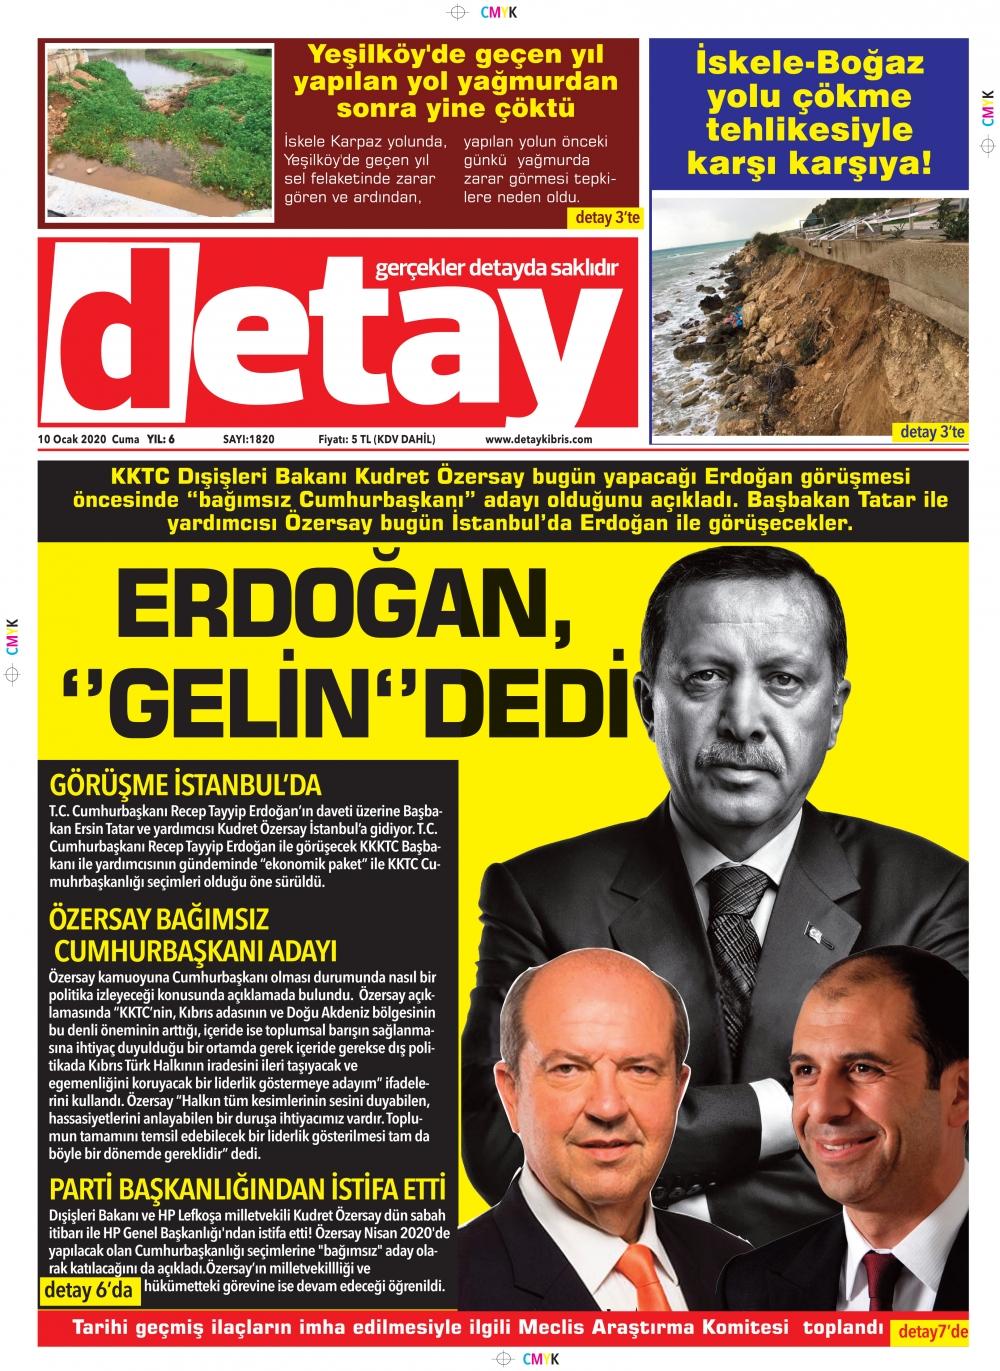 Detay Gazetes 10 Ocak 2020 galerisi resim 1